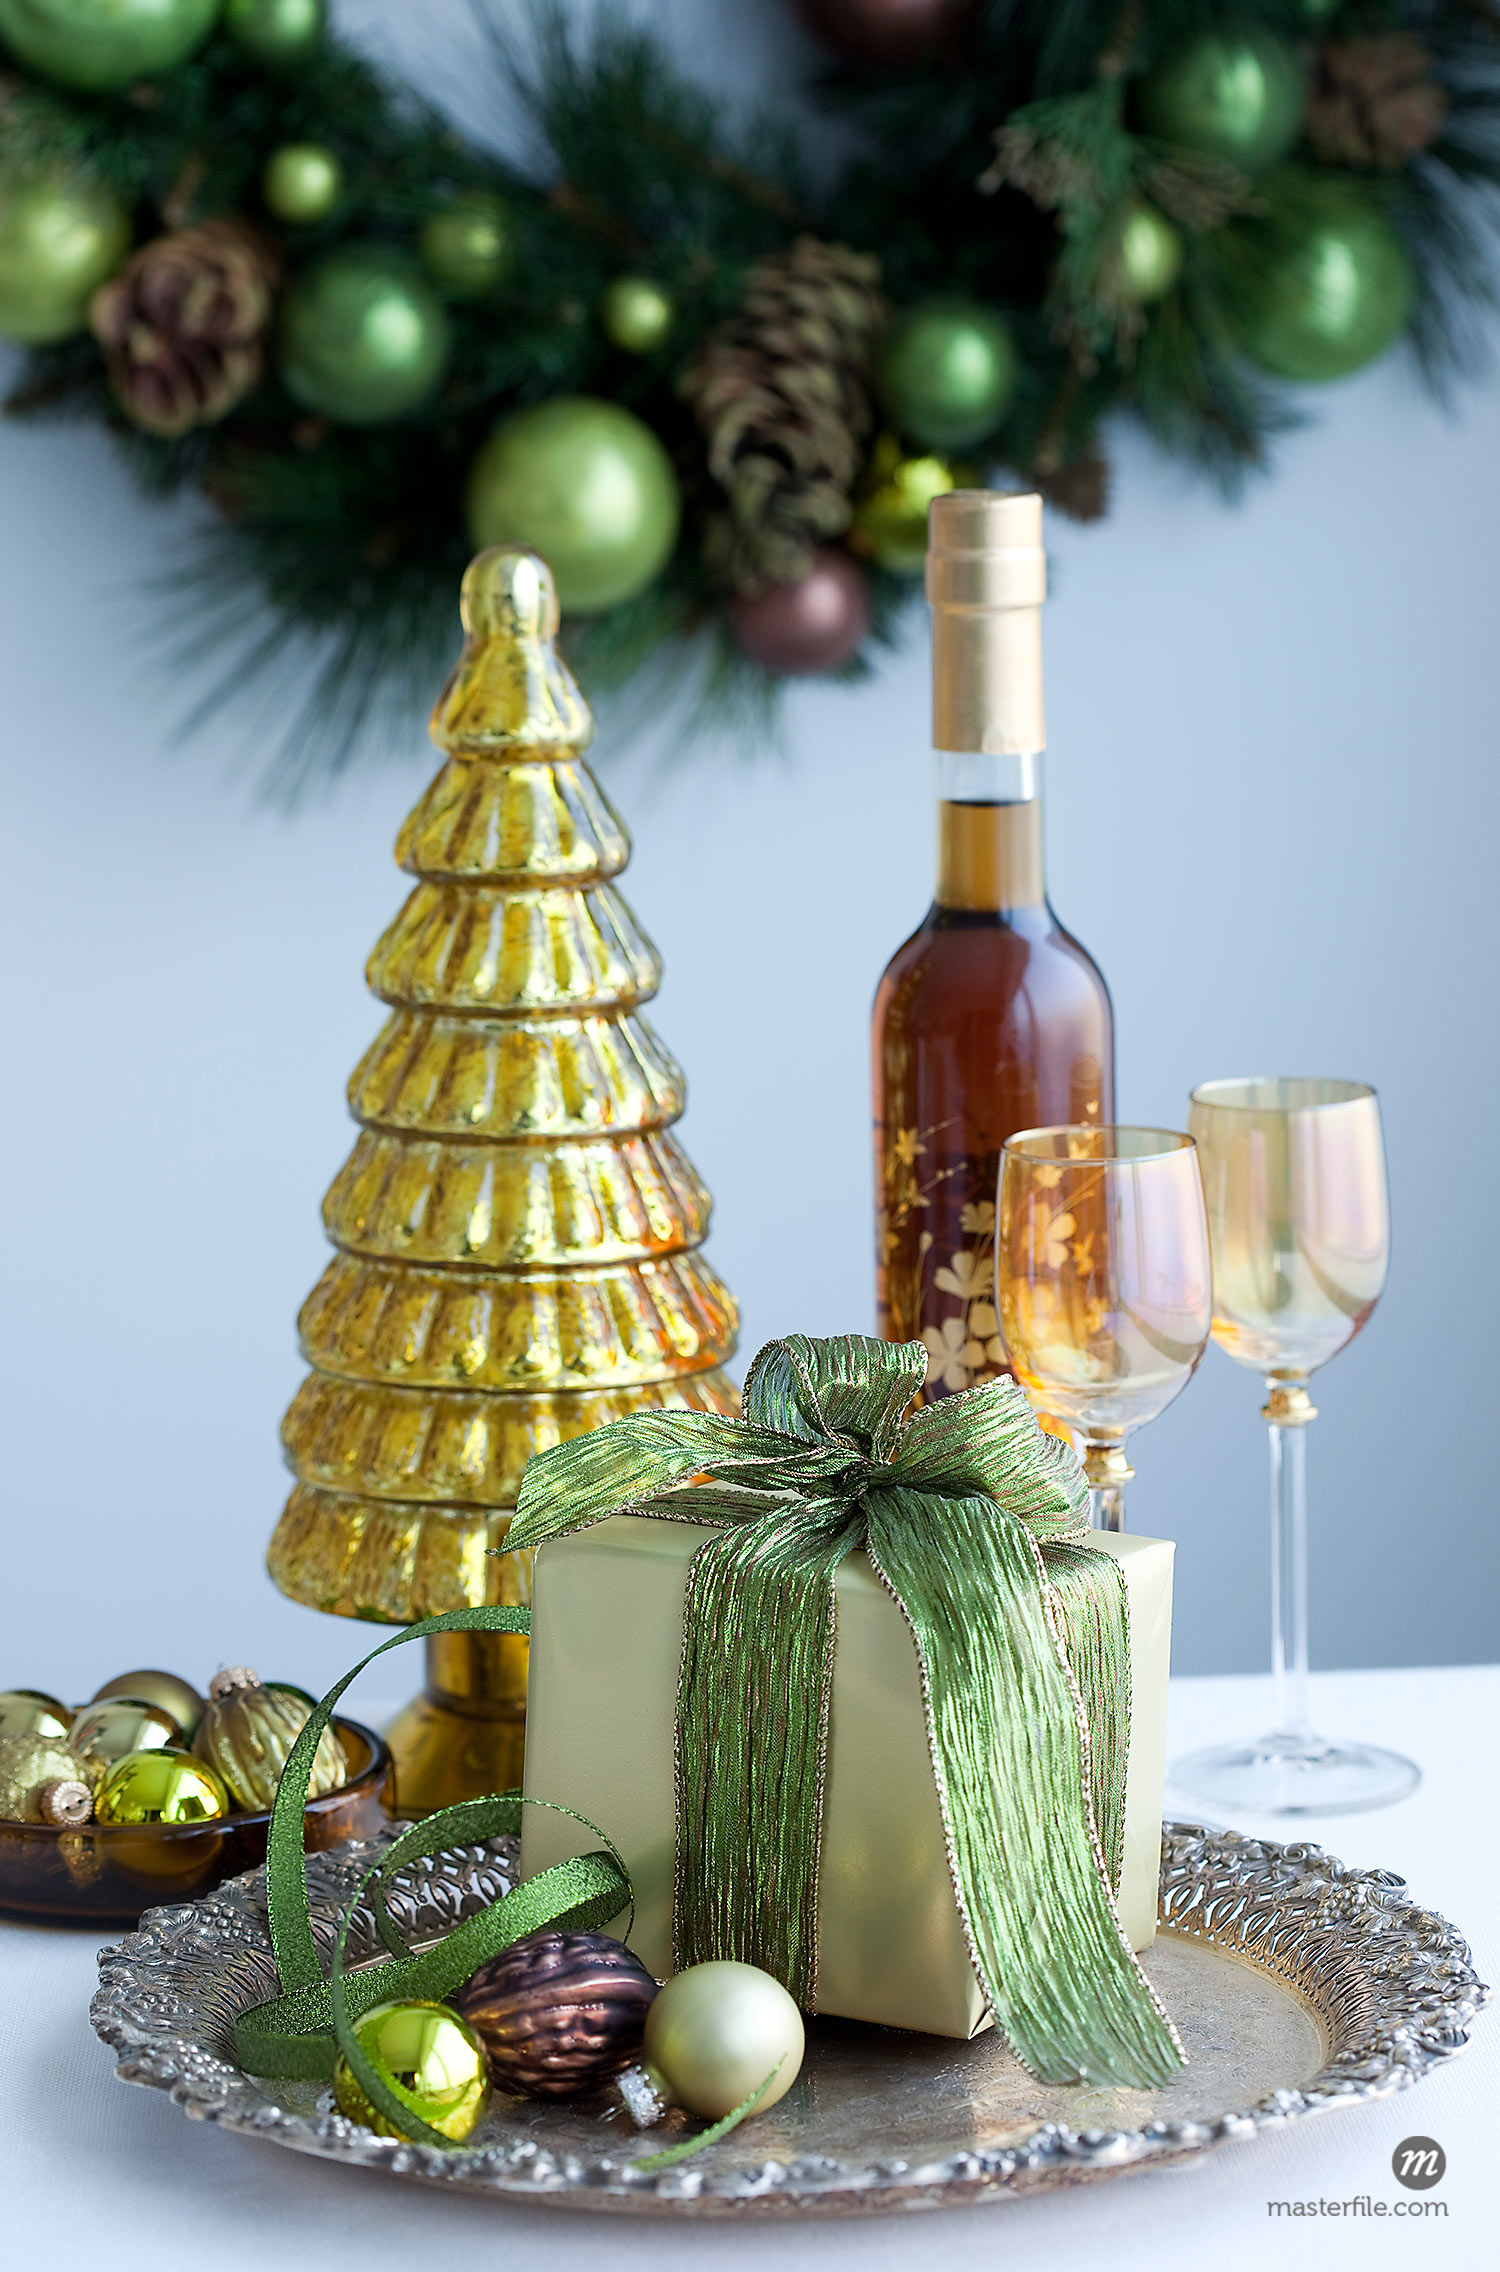 Christmas Still Life © Susan Findlay / Masterfile